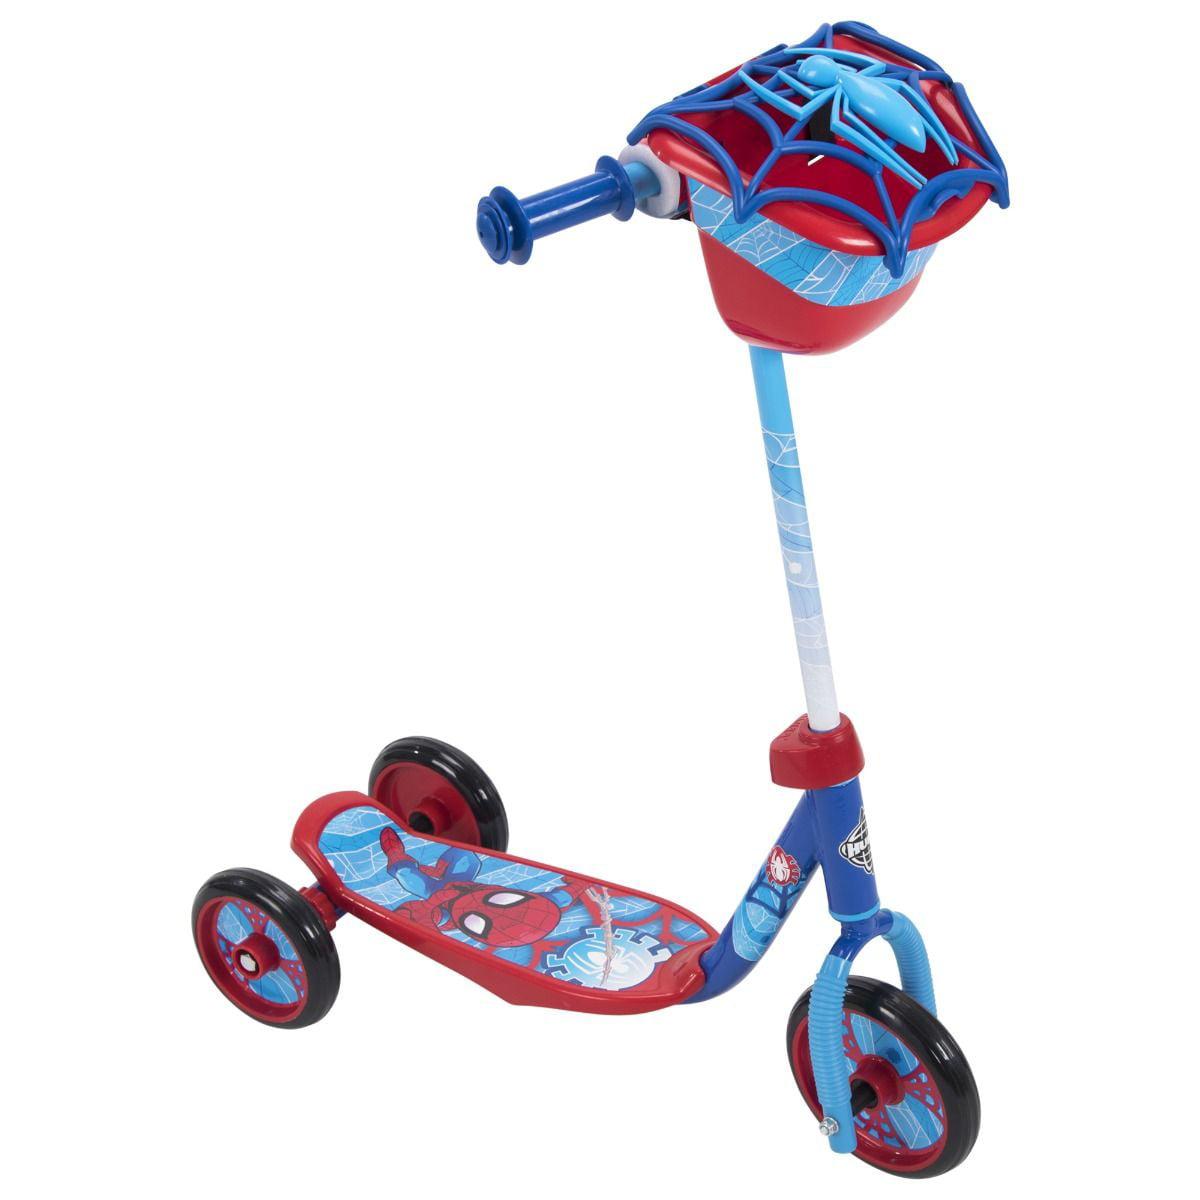 Panda Spoked v2 Stunt-Scooter rôle 110 mm Tour Latte Roller Wheel Bleu Chrome